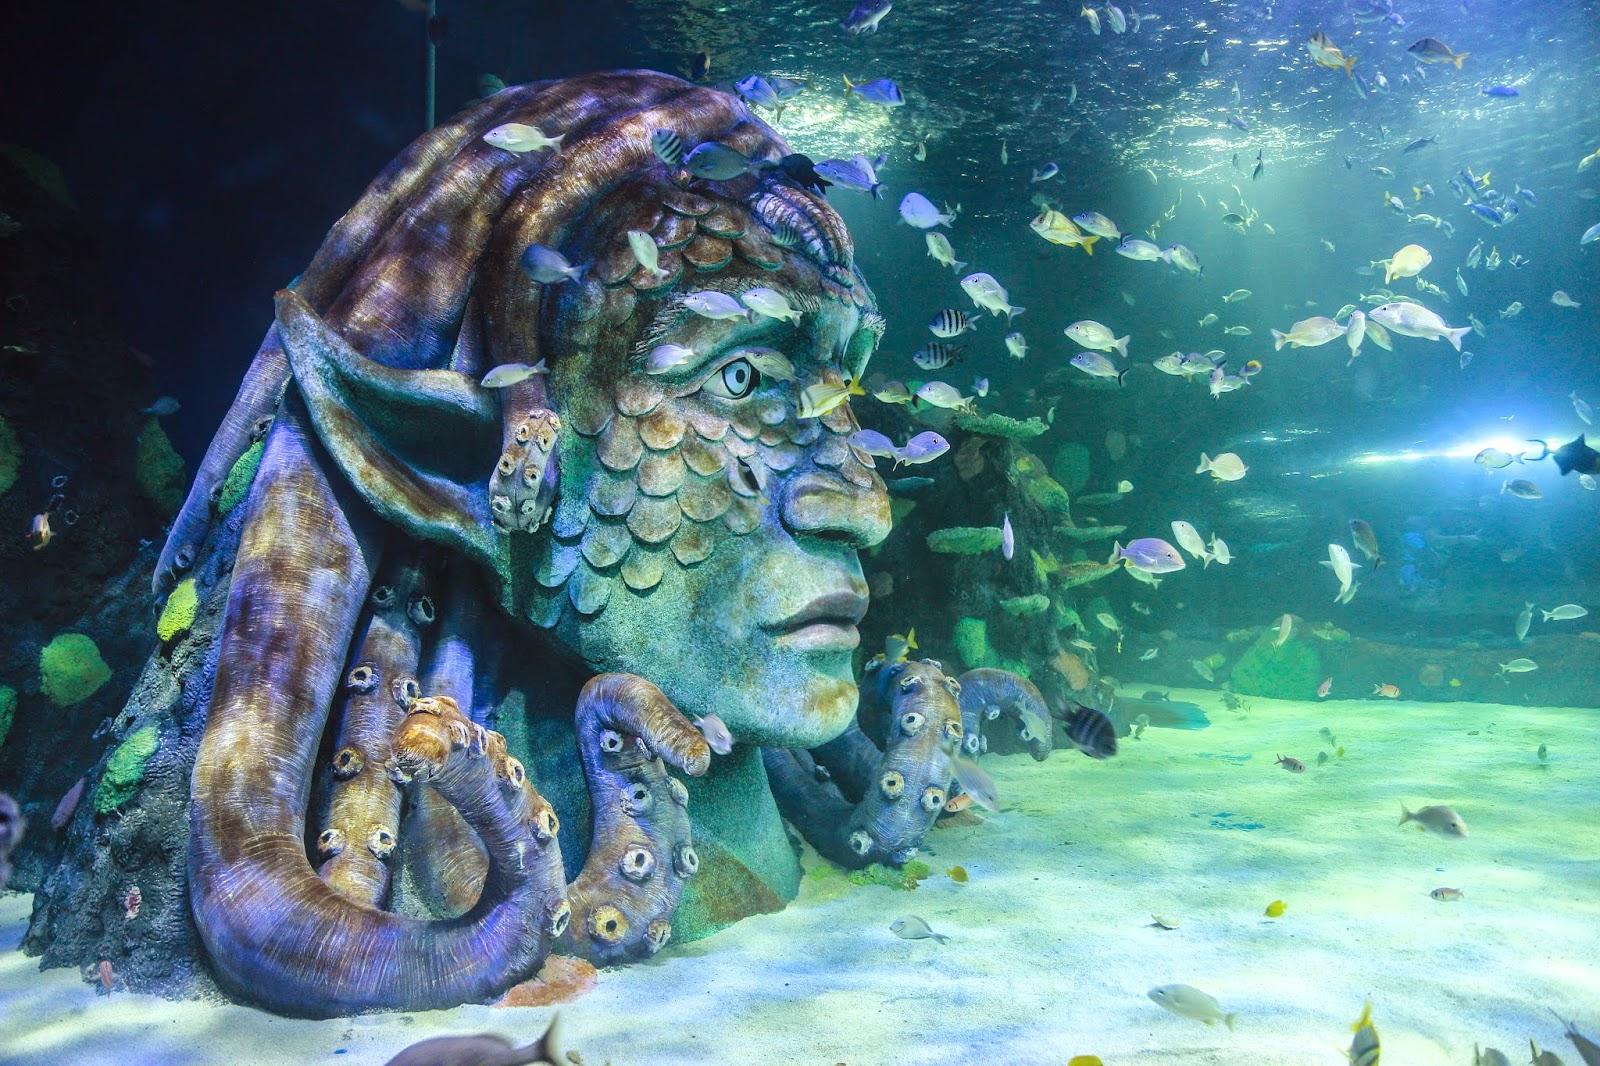 Microscope Life: Michigan's Sea Life Aquarium